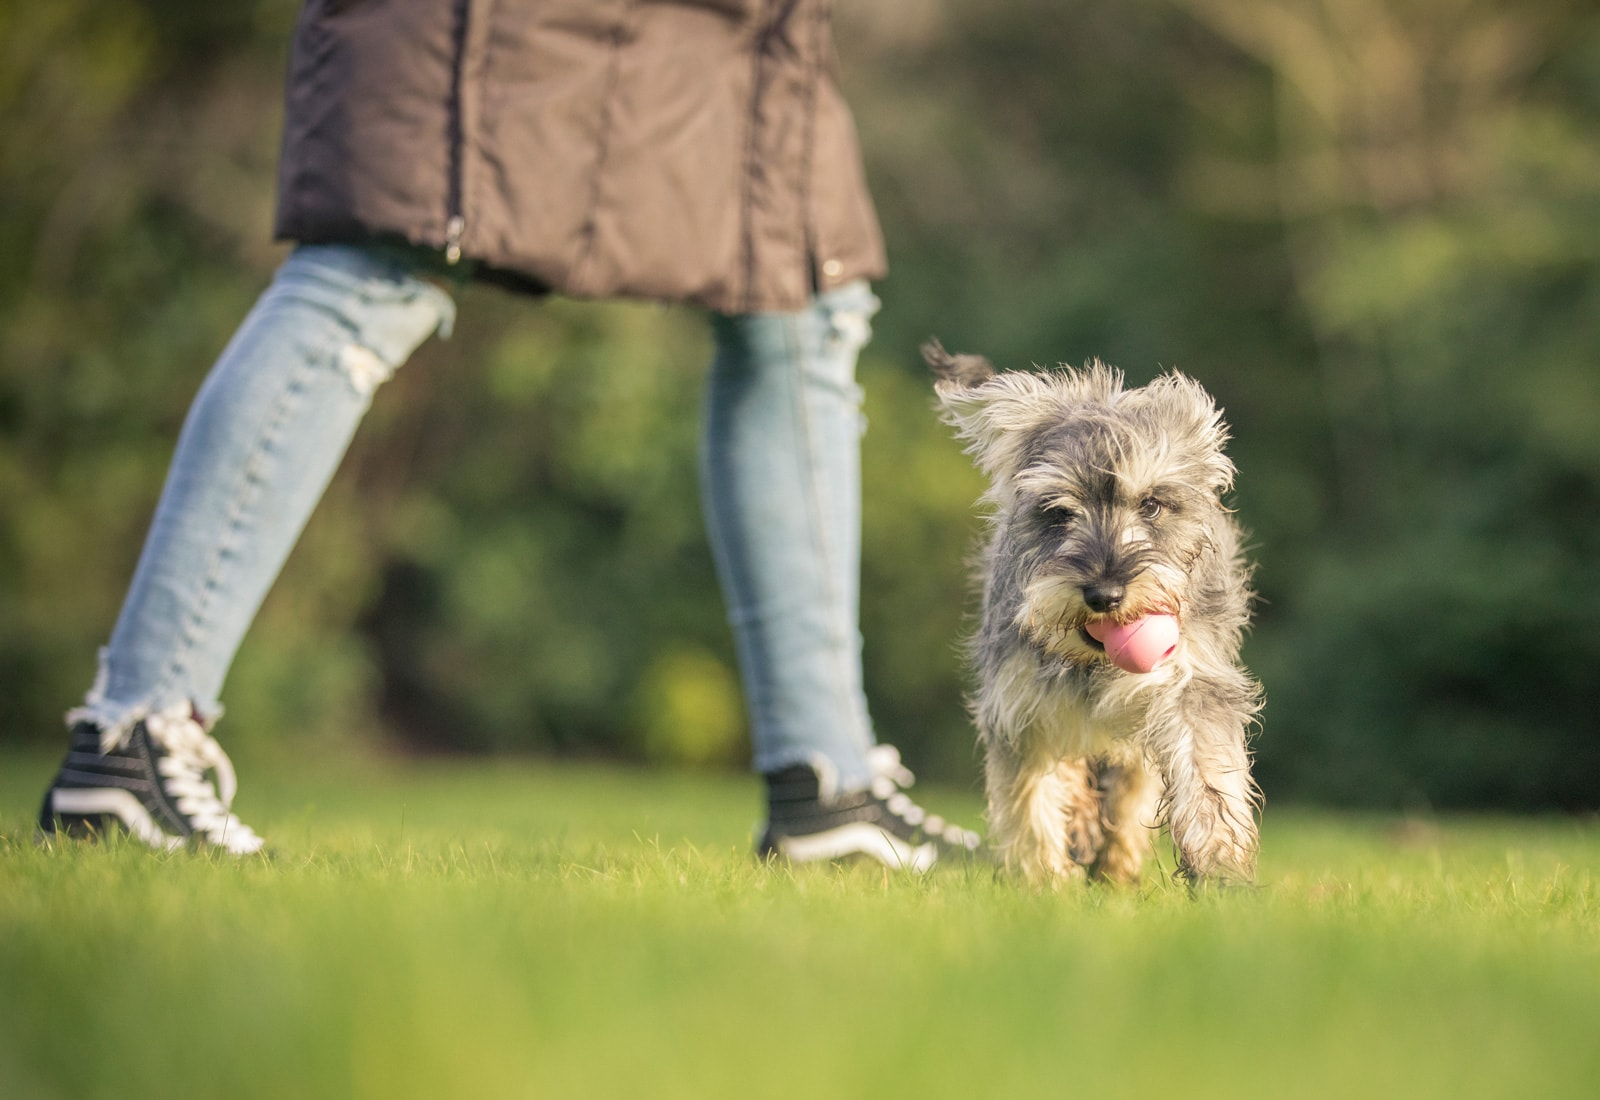 Best Puppy Training Classes Near Me In Ireland